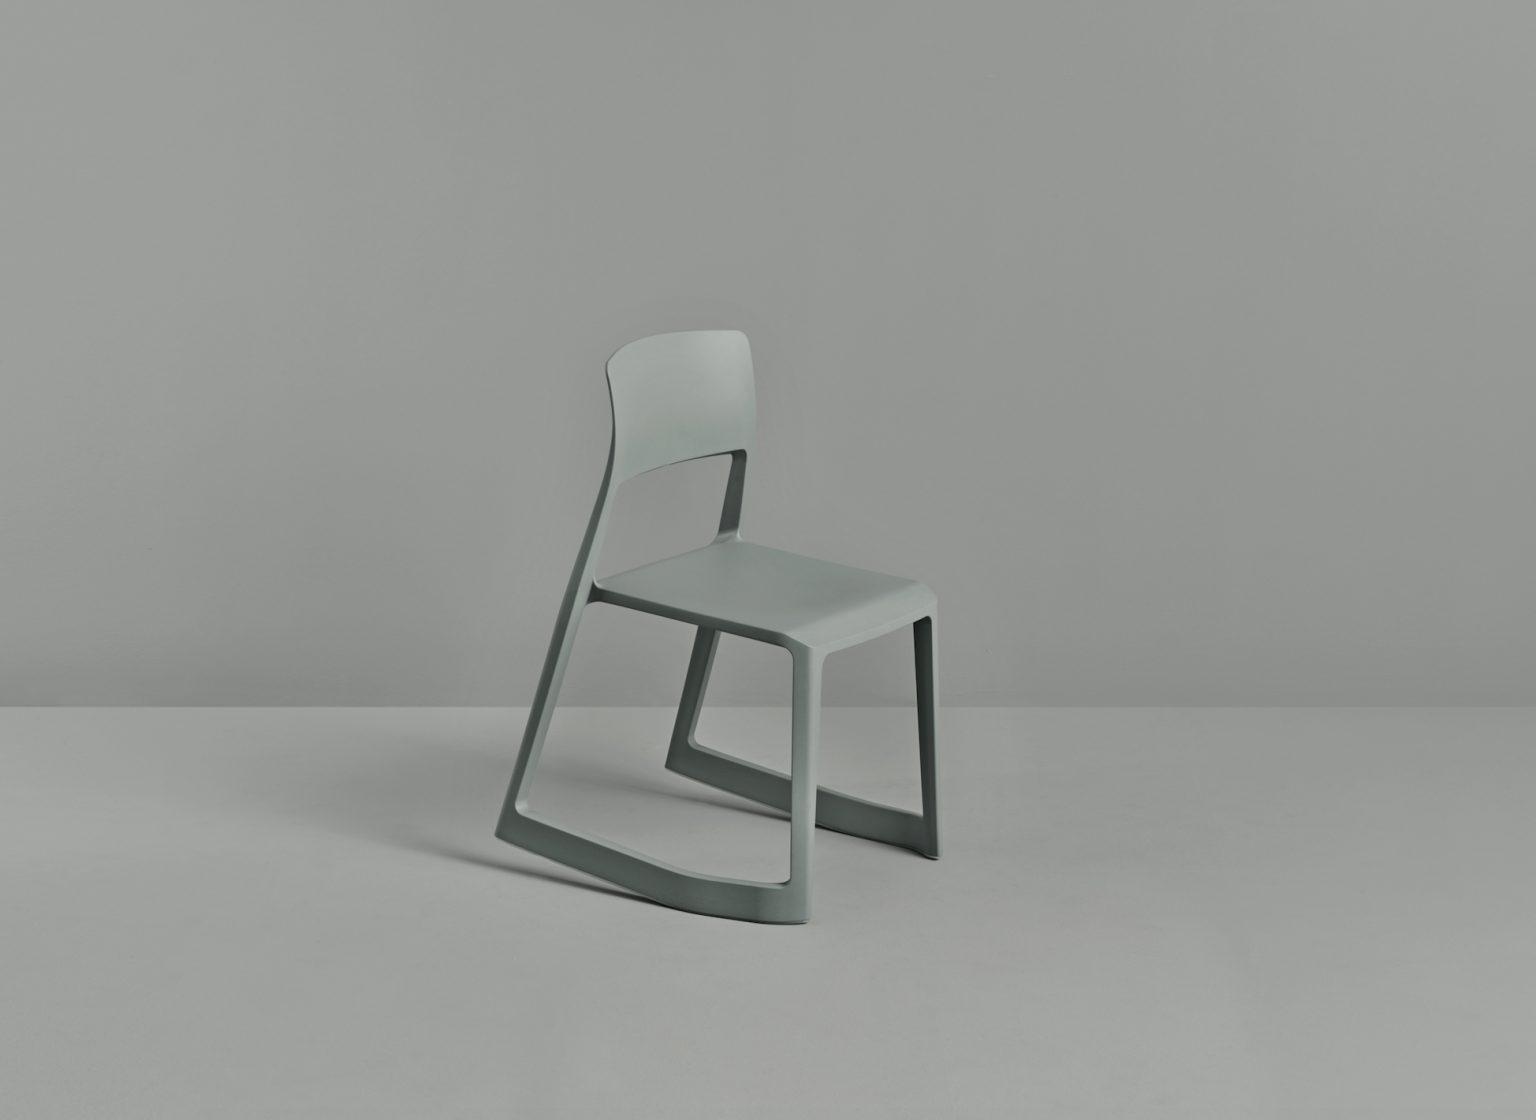 Biennale Interieur - Belgium's leading design and interior event - Ttr-2-copy.jpg